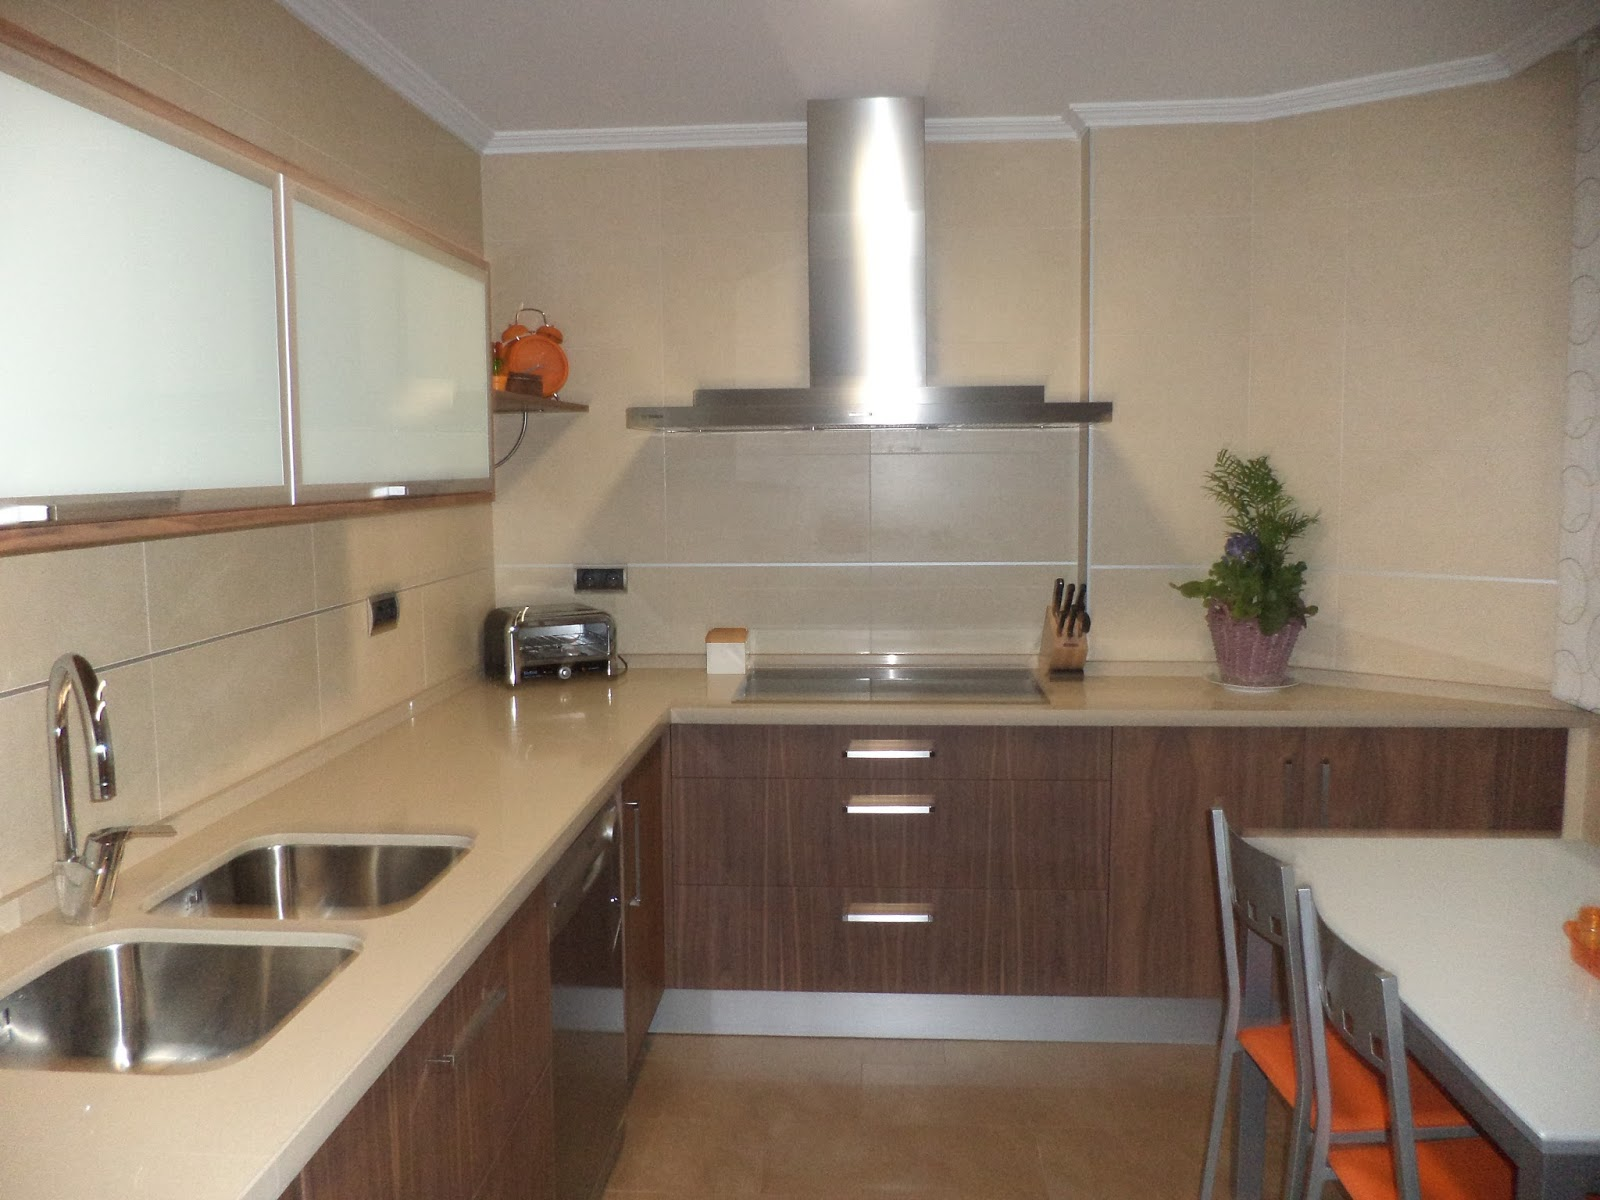 Muebles sevilla barbero 1 cocina en chapa natural de for Cocinas sevilla